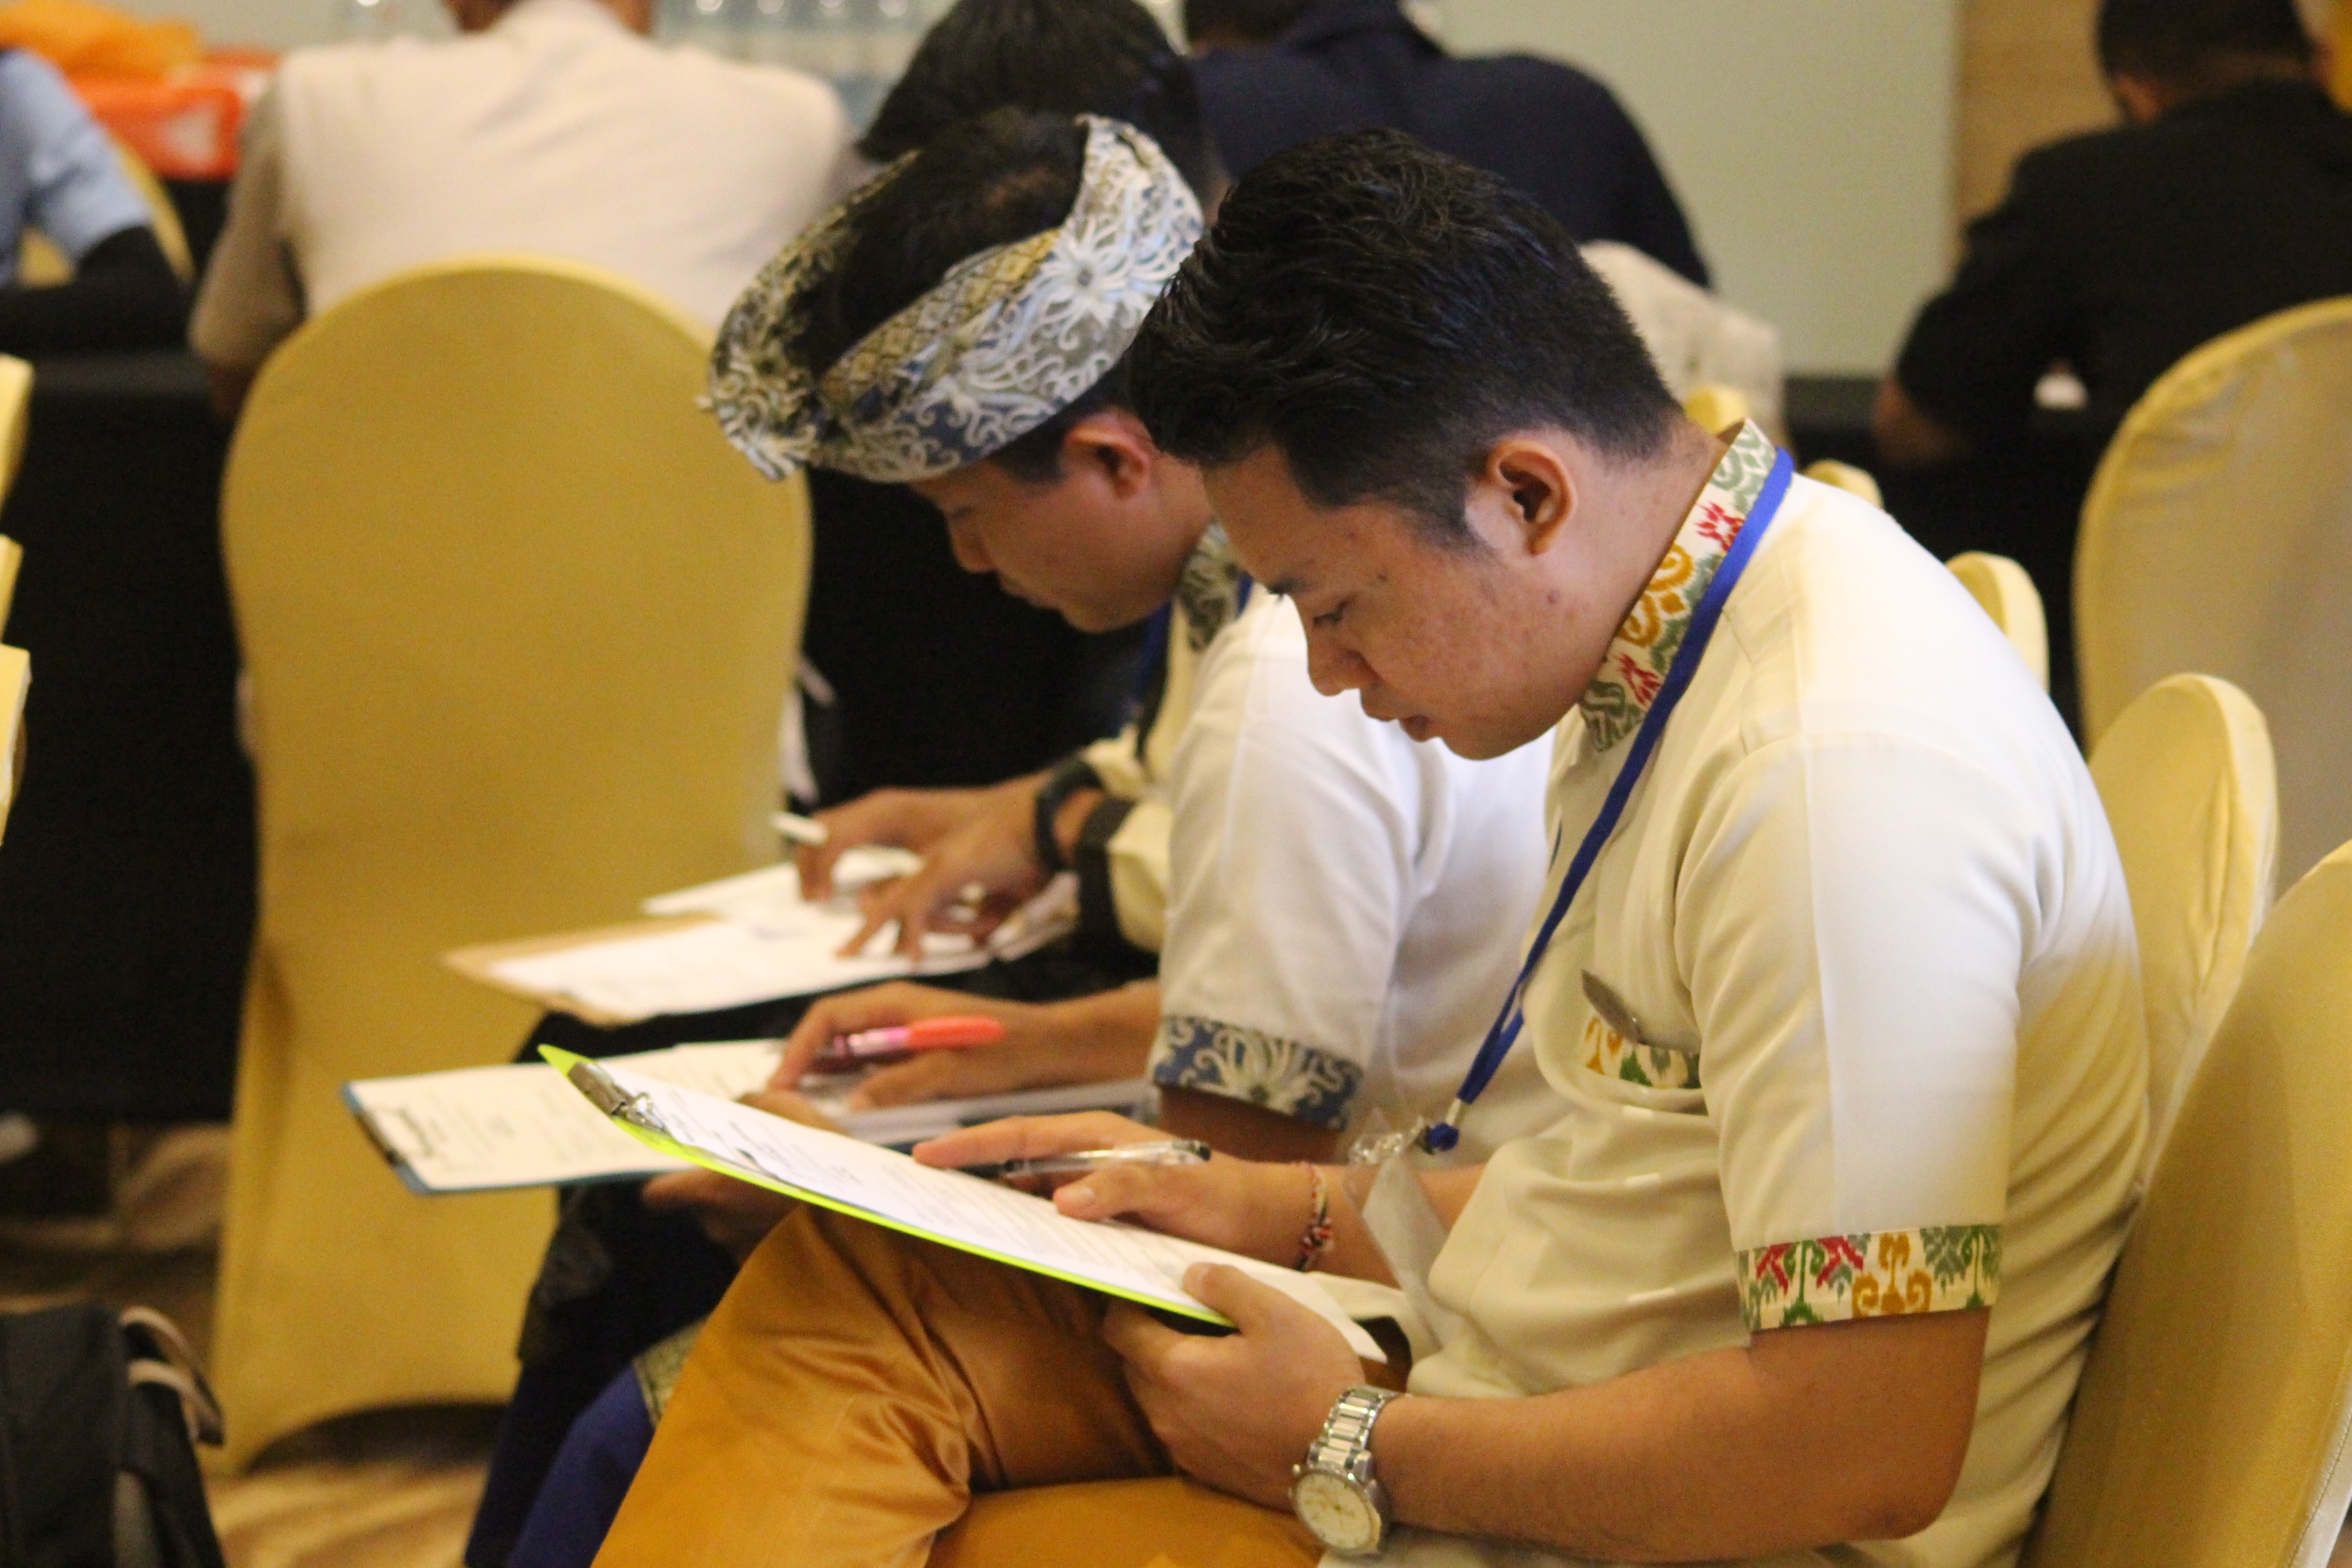 Peserta ROTY 2019 fokus melakukan Writing Contest